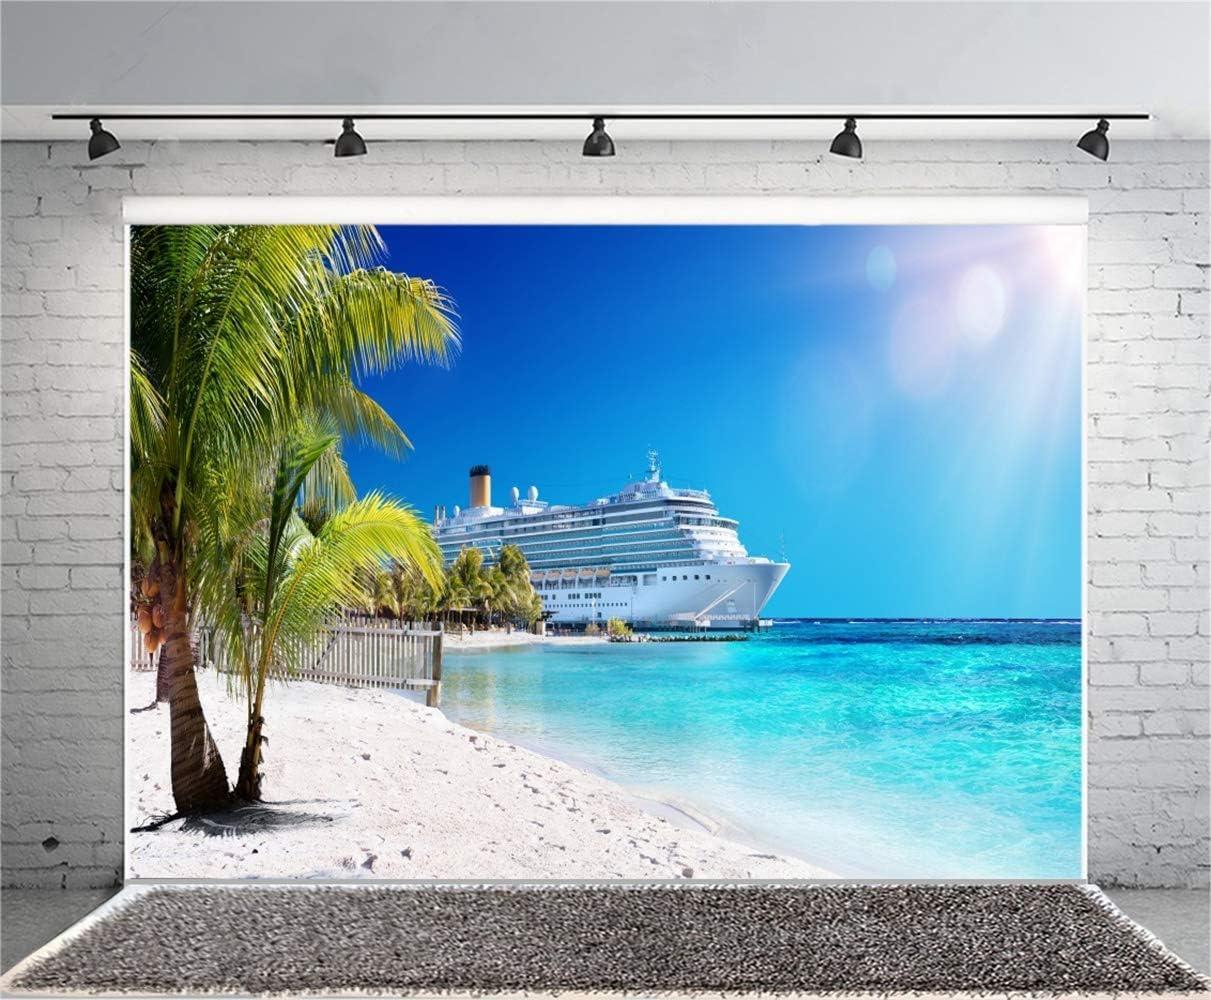 10x7ft Seaside Wharf Berthed Steamship Scene Vinyl Photography Background Summer Dazzling Sunshine Palm Blue Sky Seawater Scenic Backdrop Wedding Honeymoon Shoot Holiday Vacation Wallpaper